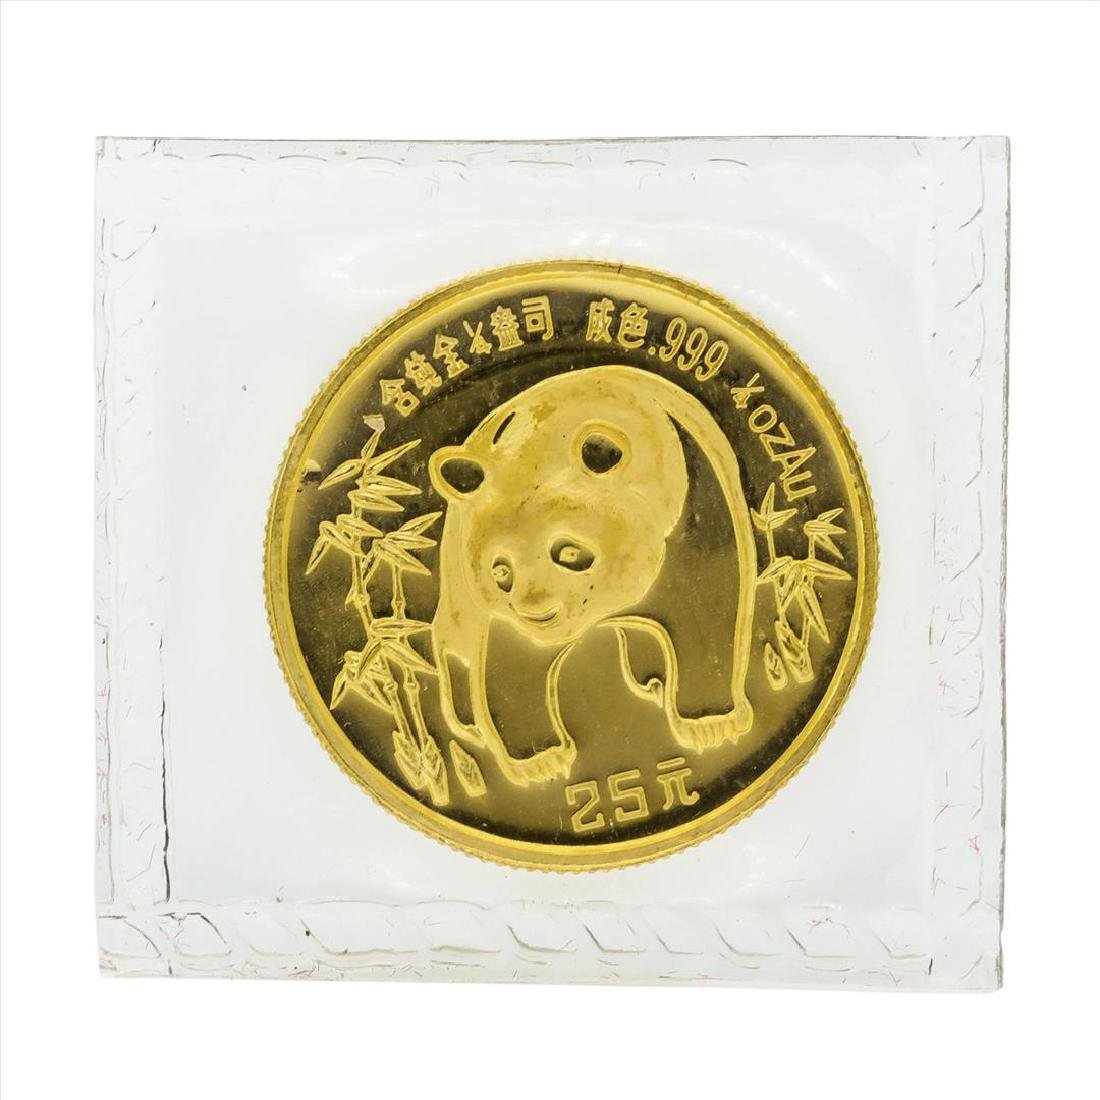 1986 25 Yuan China Panda 1/4 oz Gold Coin - 2